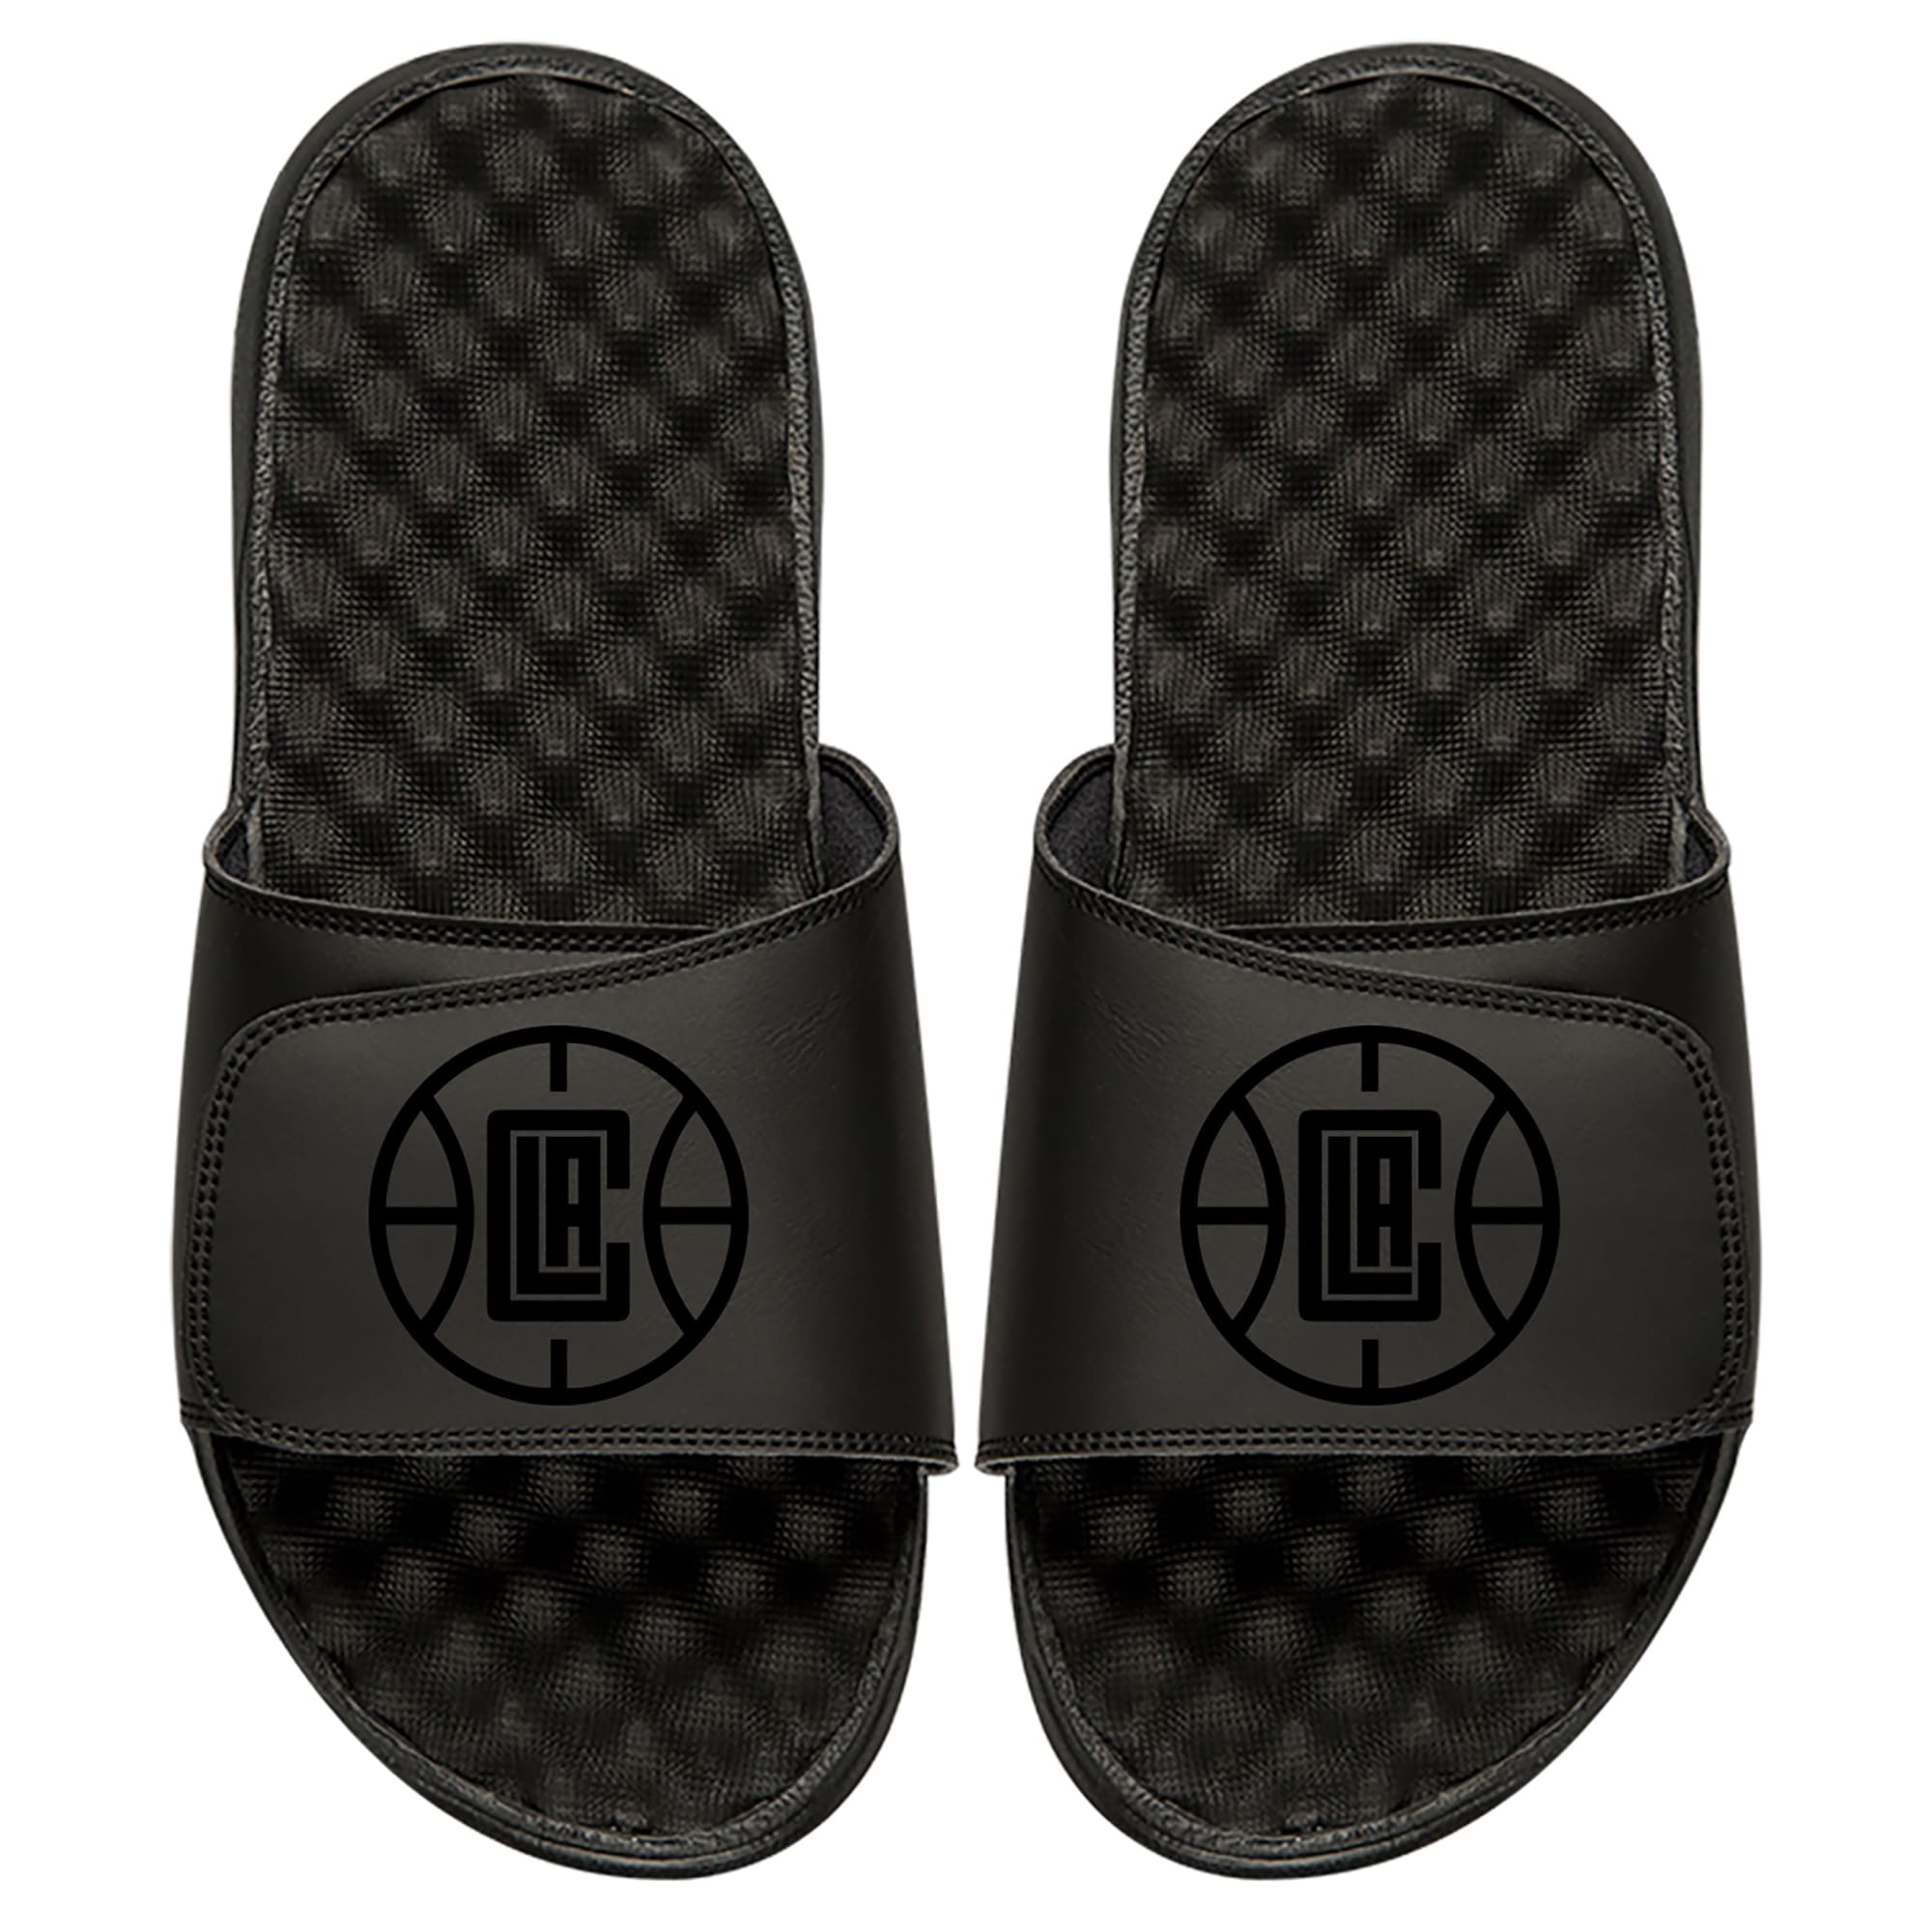 LA Clippers ISlide Tonal Slide Sandals - Black